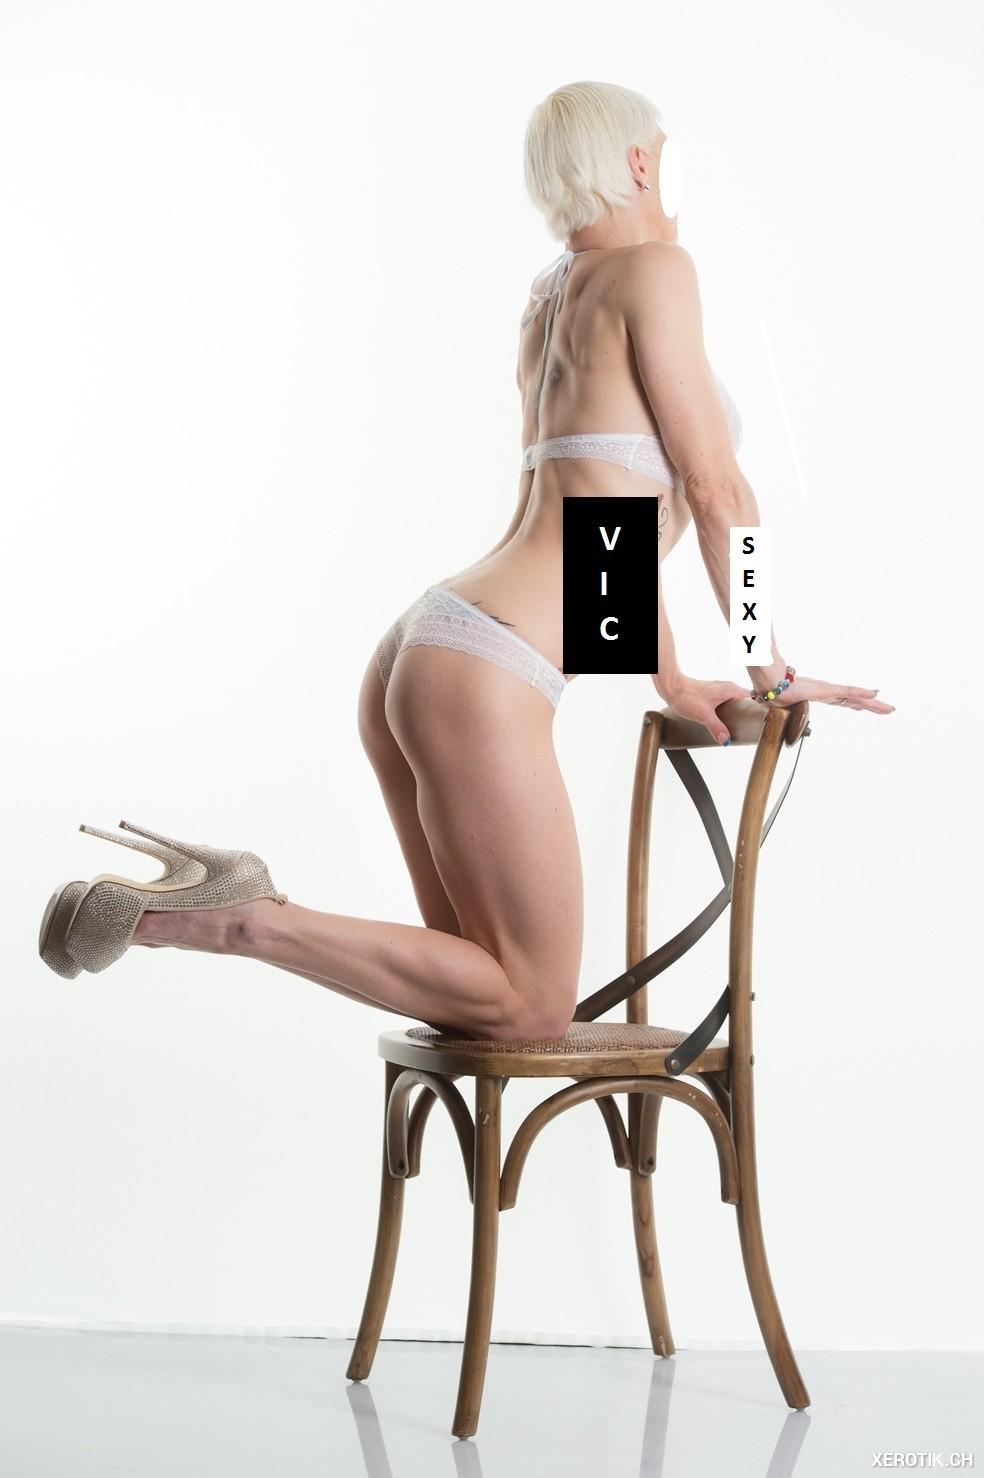 Erotik inserate Blonder Sexengel